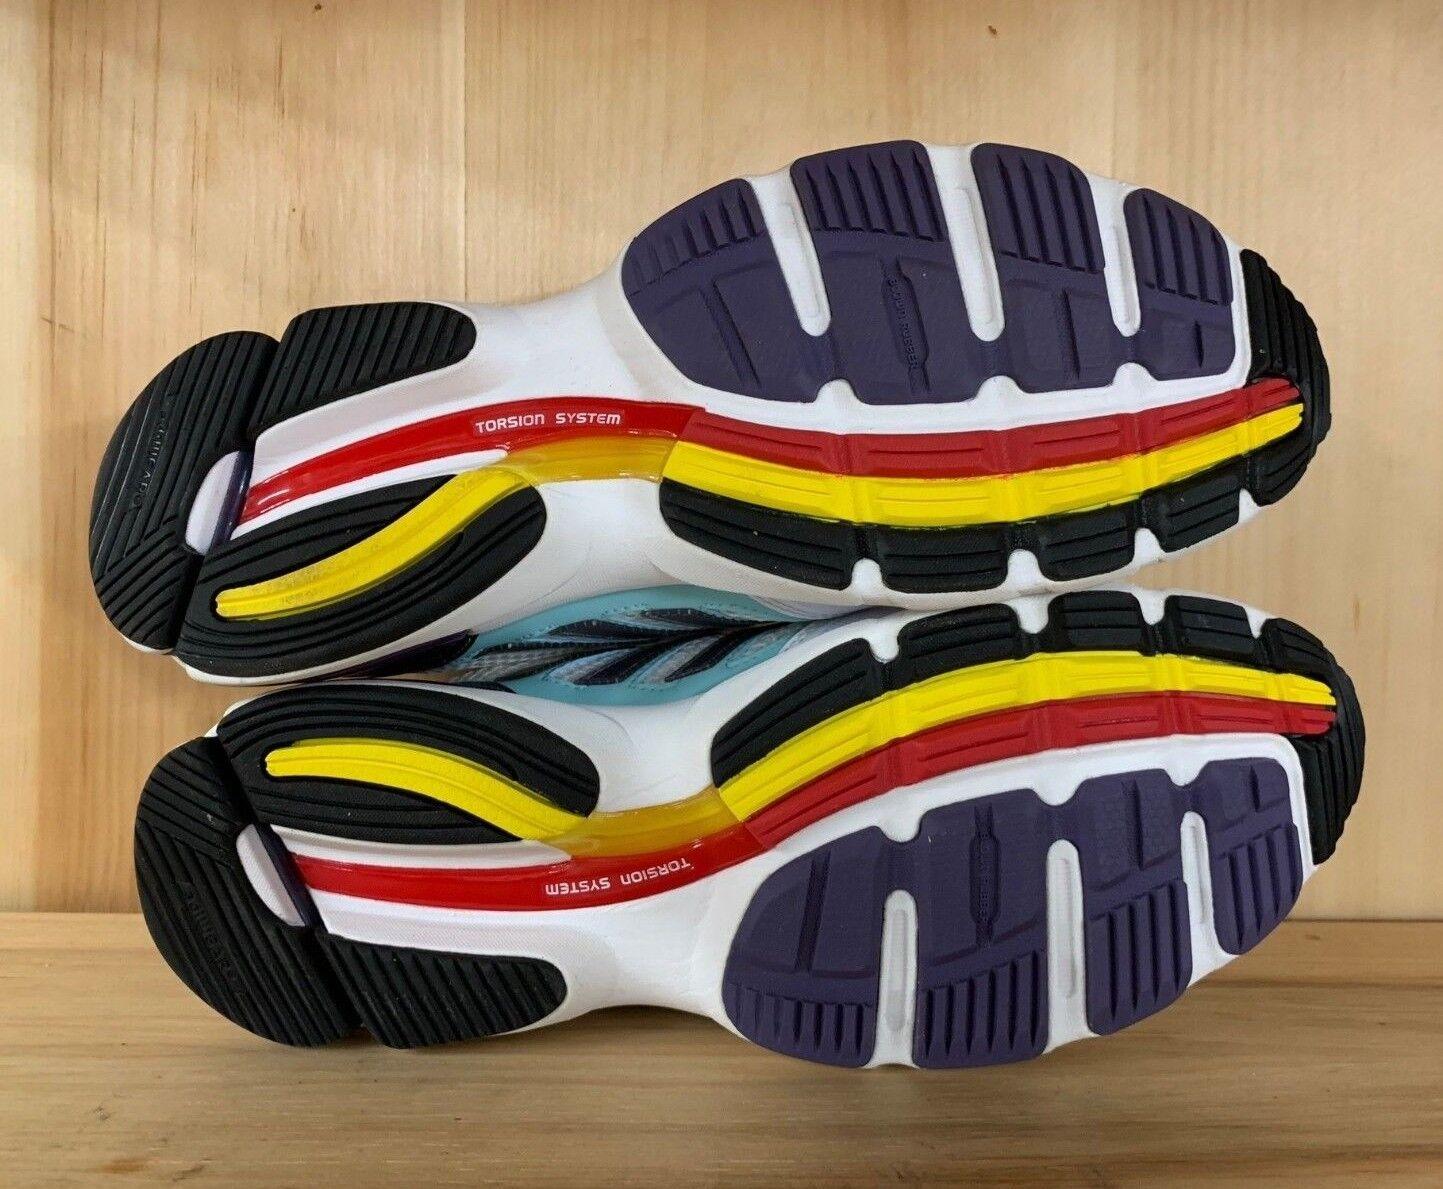 Adidas zx 8000 sp bianco viola in donne wmns wmns wmns sz 9 - 12 g04889 | Grande Svendita  | Maschio/Ragazze Scarpa  2aec63